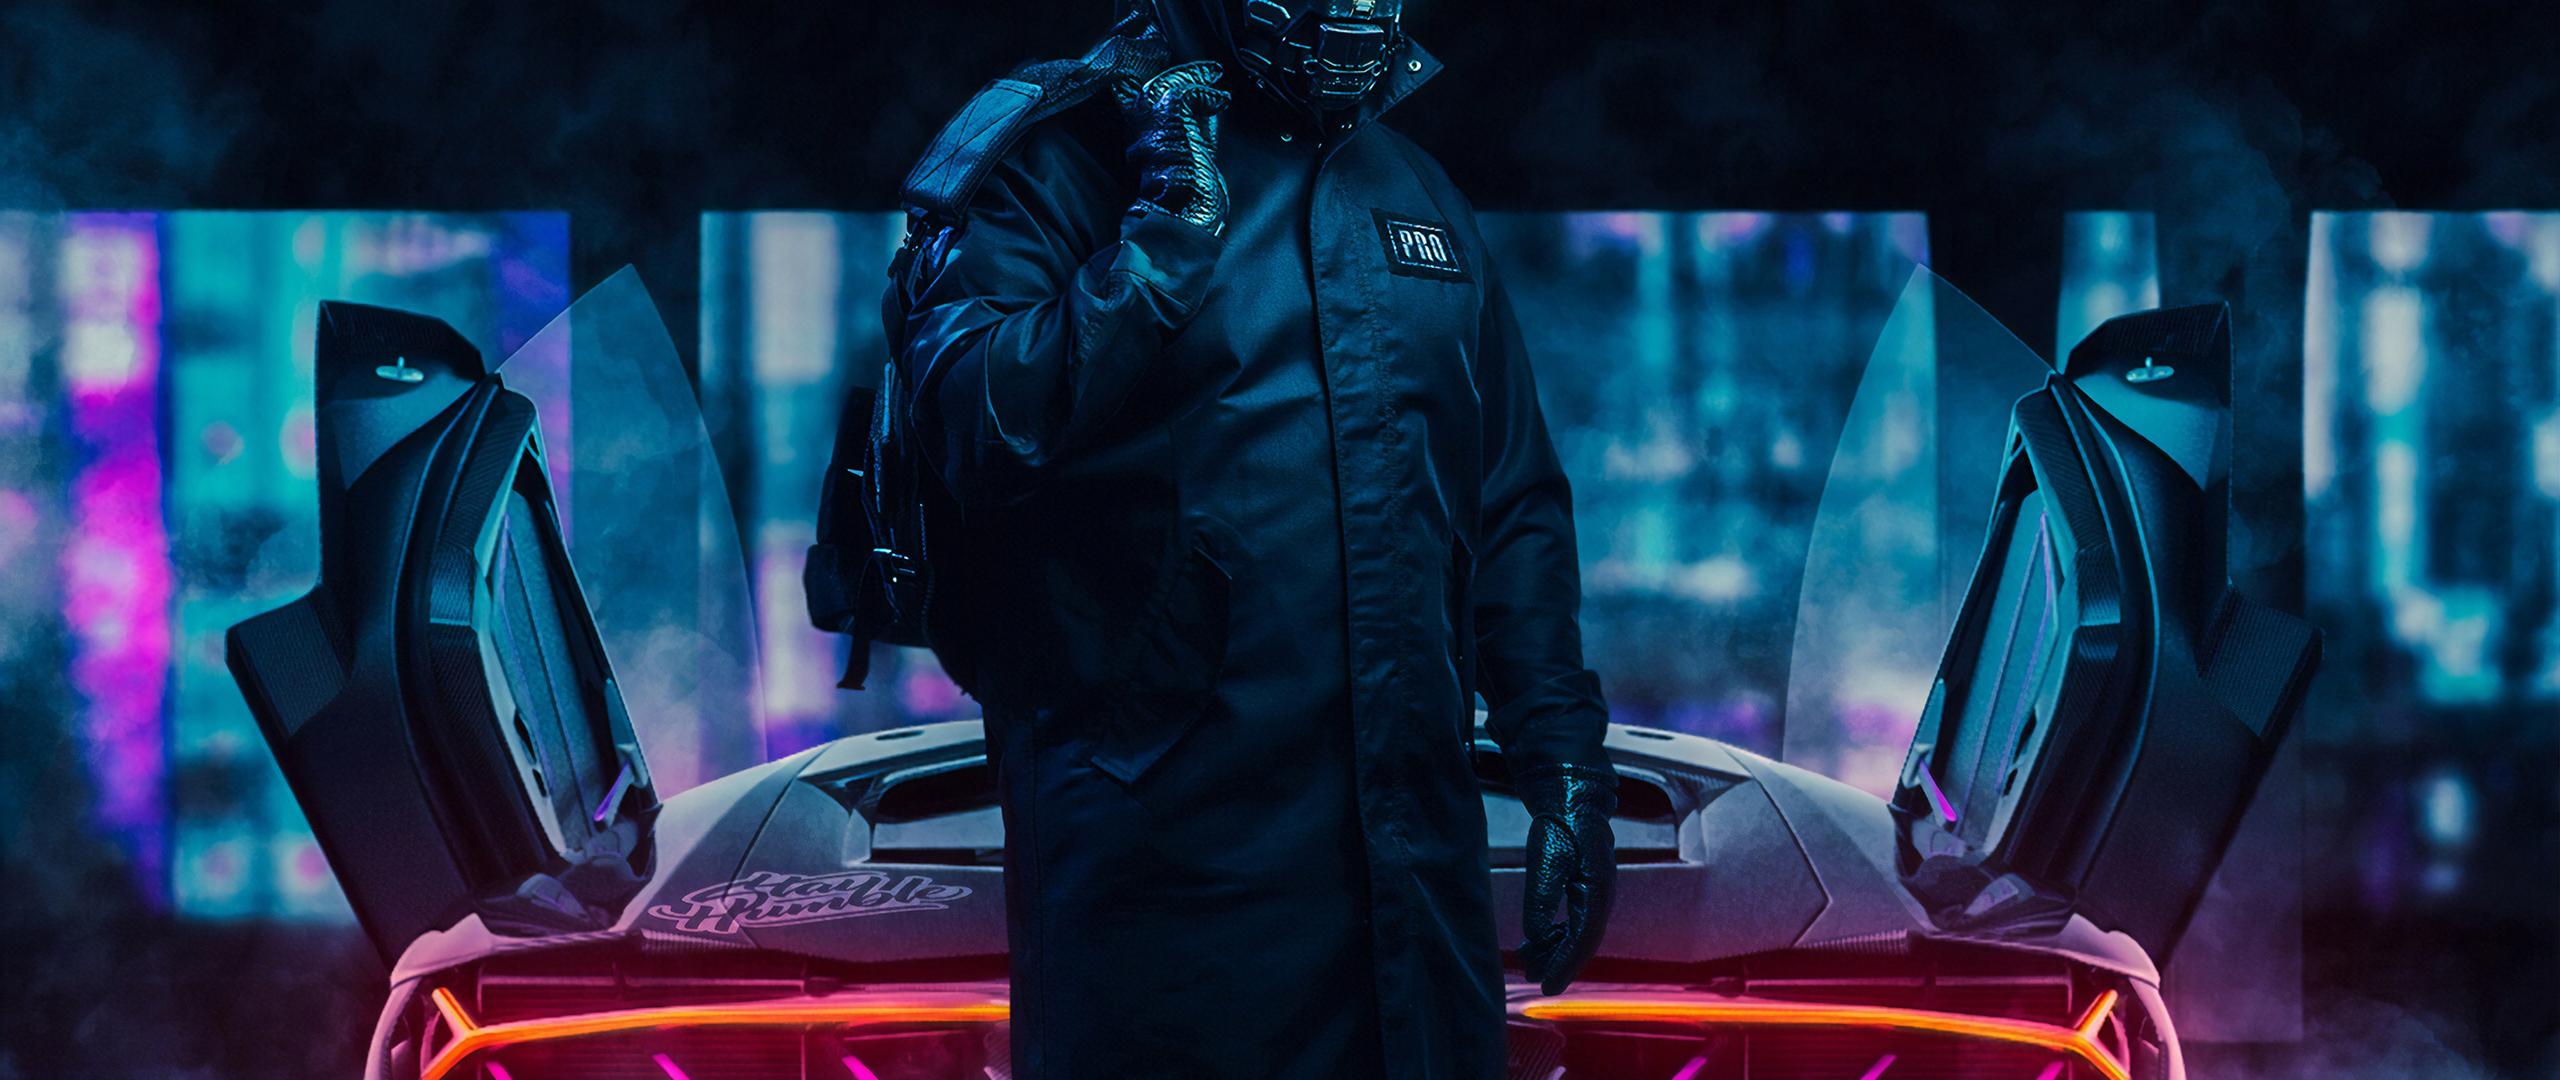 cyberpunk-rider-8i.jpg